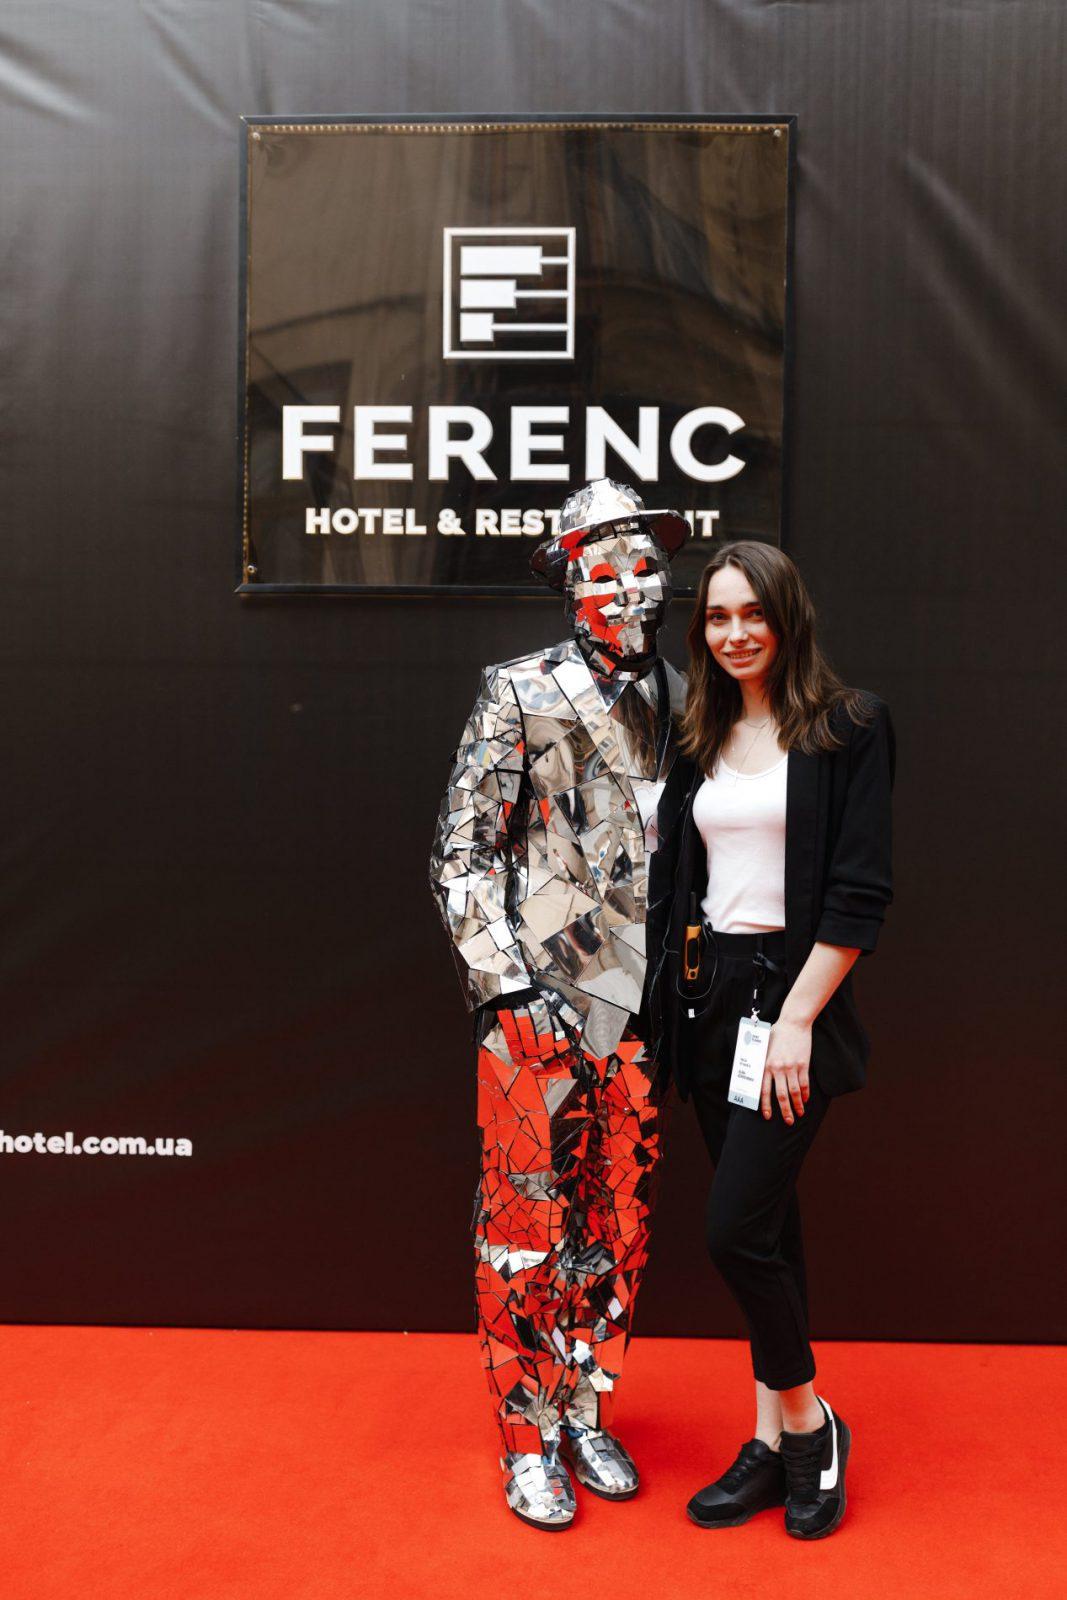 Ferenc0045